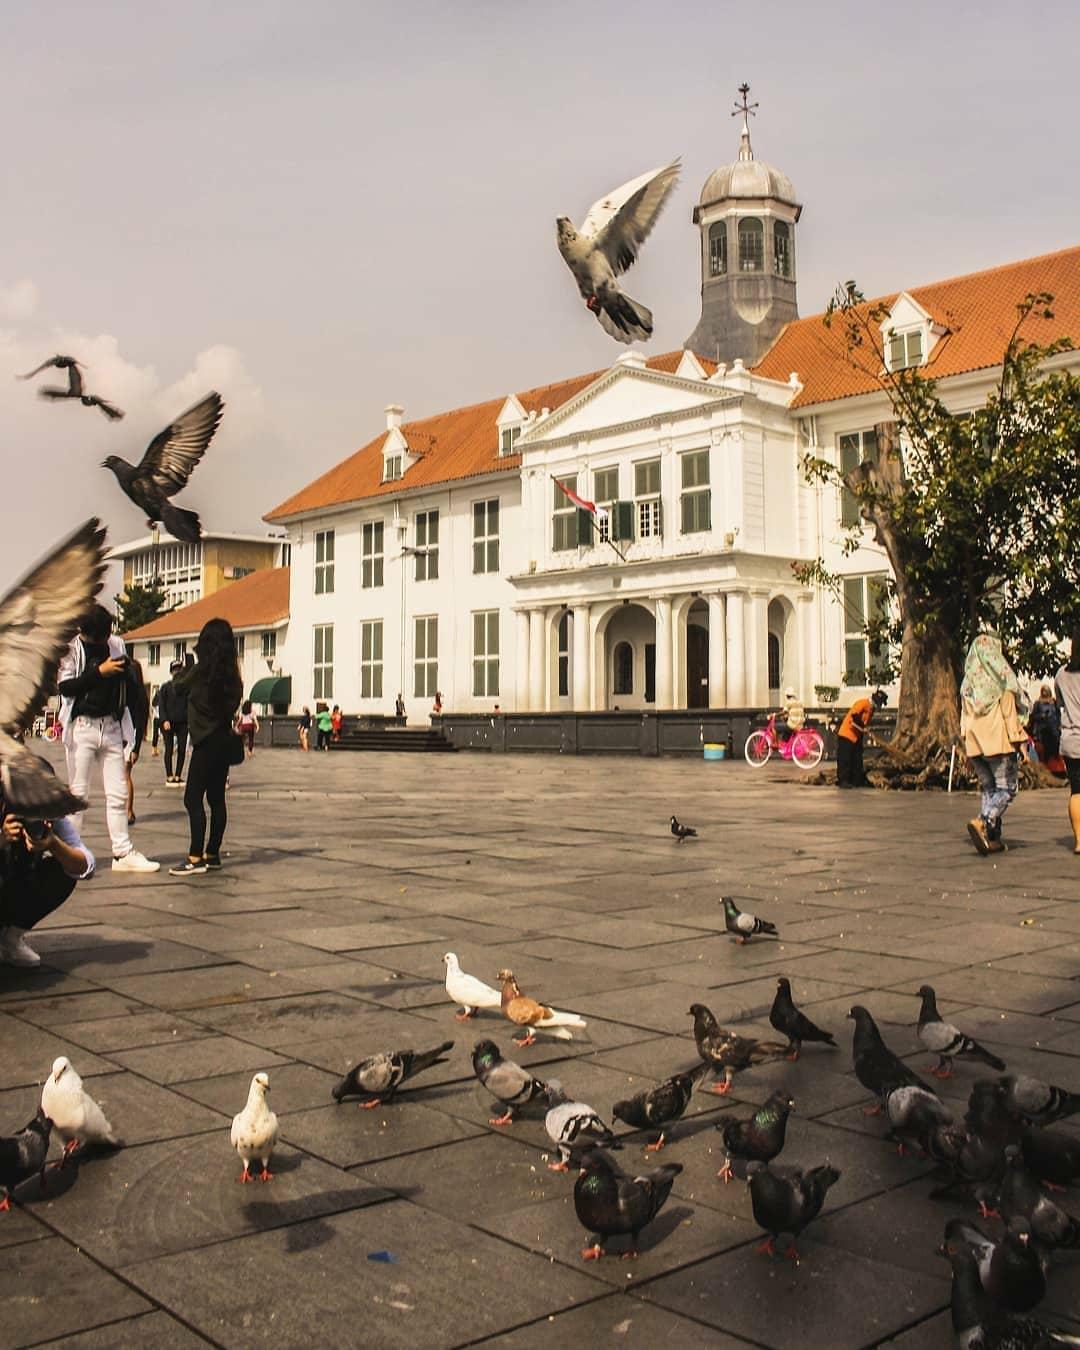 6 Tempat Wisata Kota Tua Jakarta yang Wajib Dikunjungi